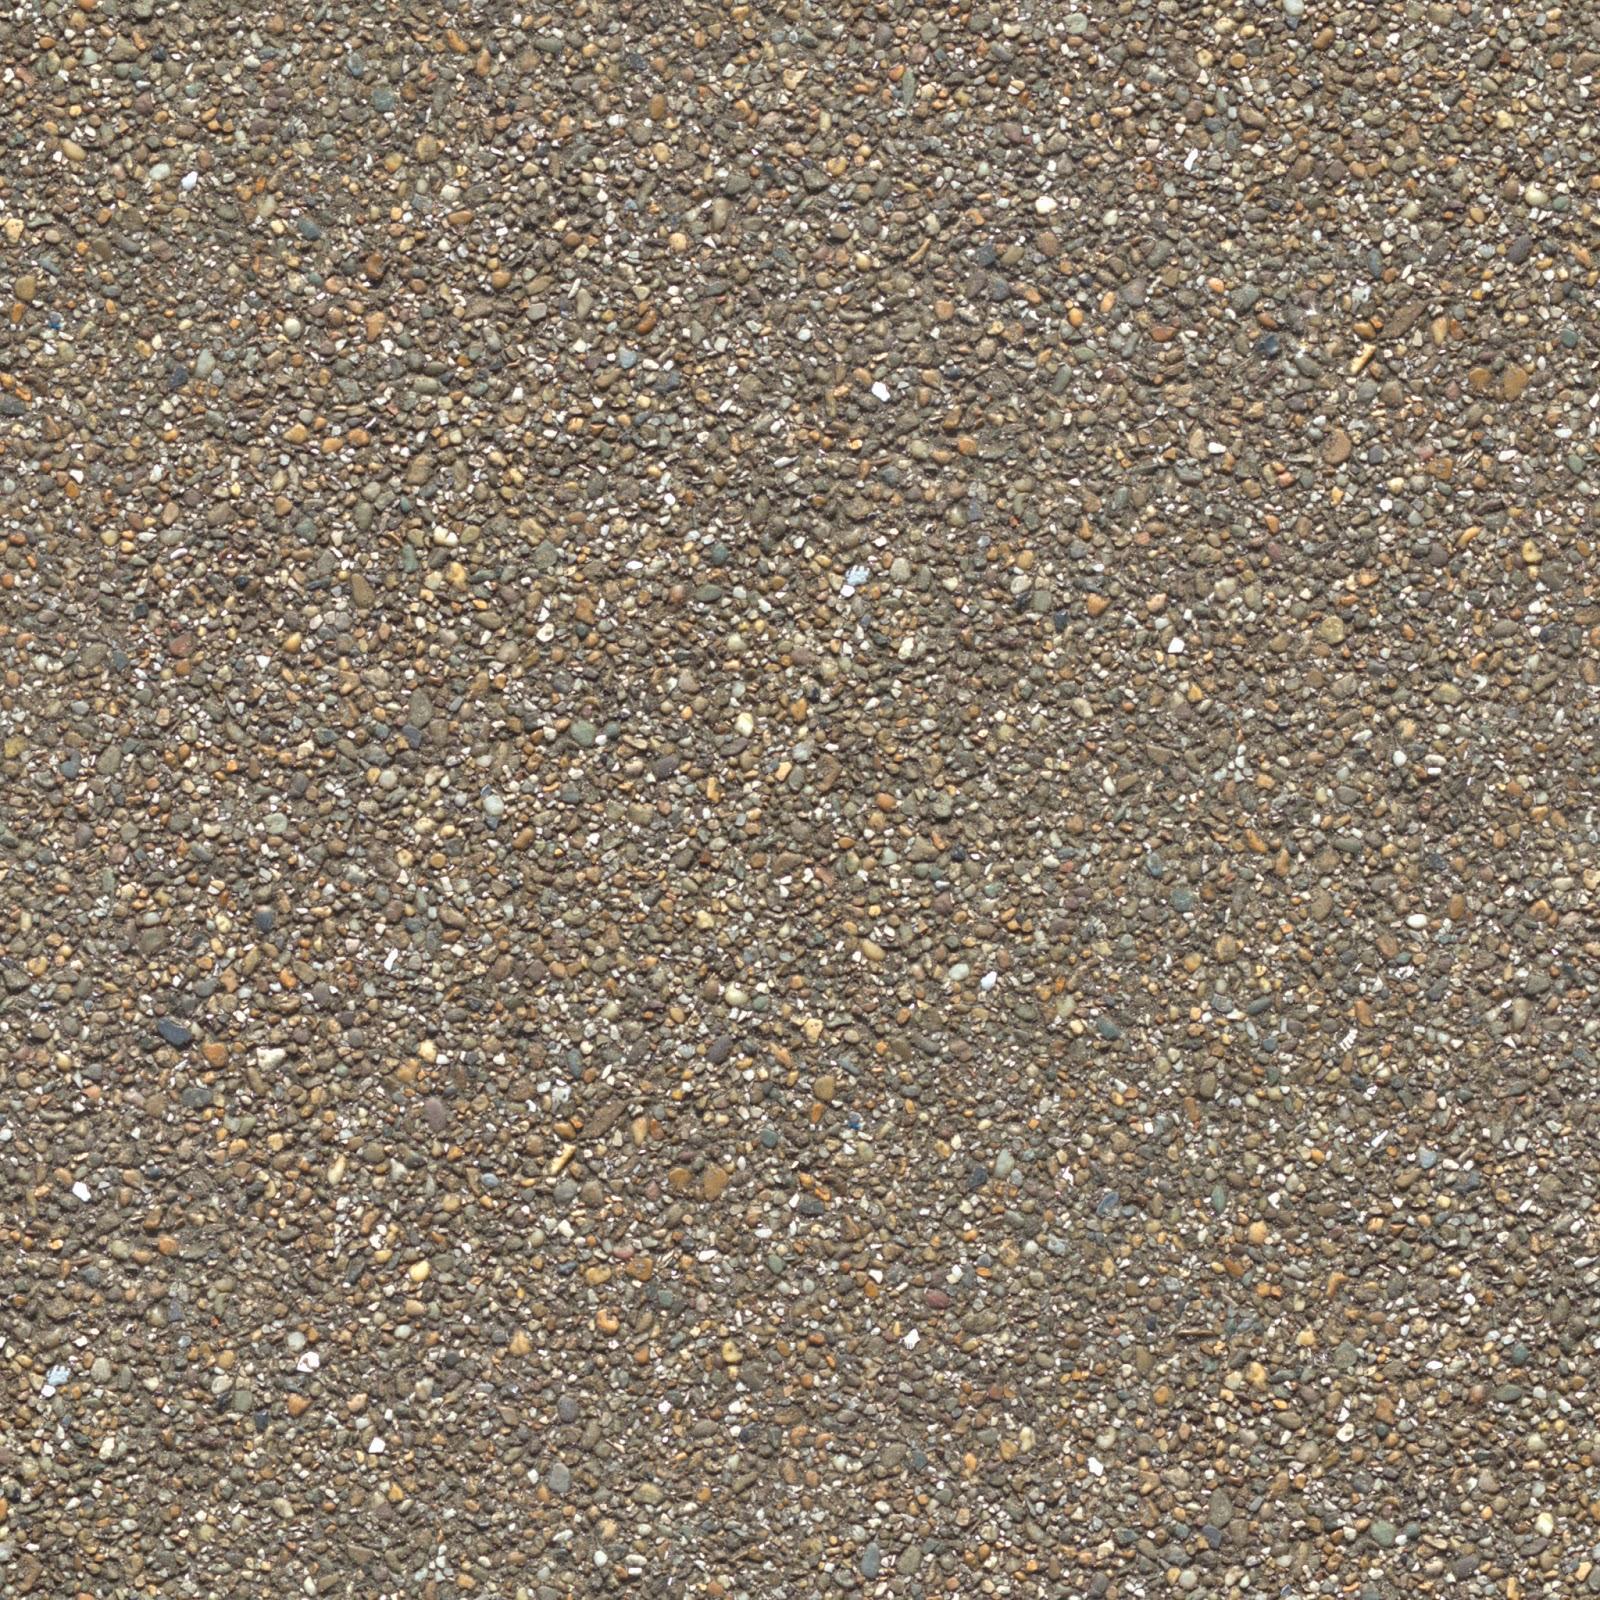 Pebblestone small ground seamless texture 2048x2048